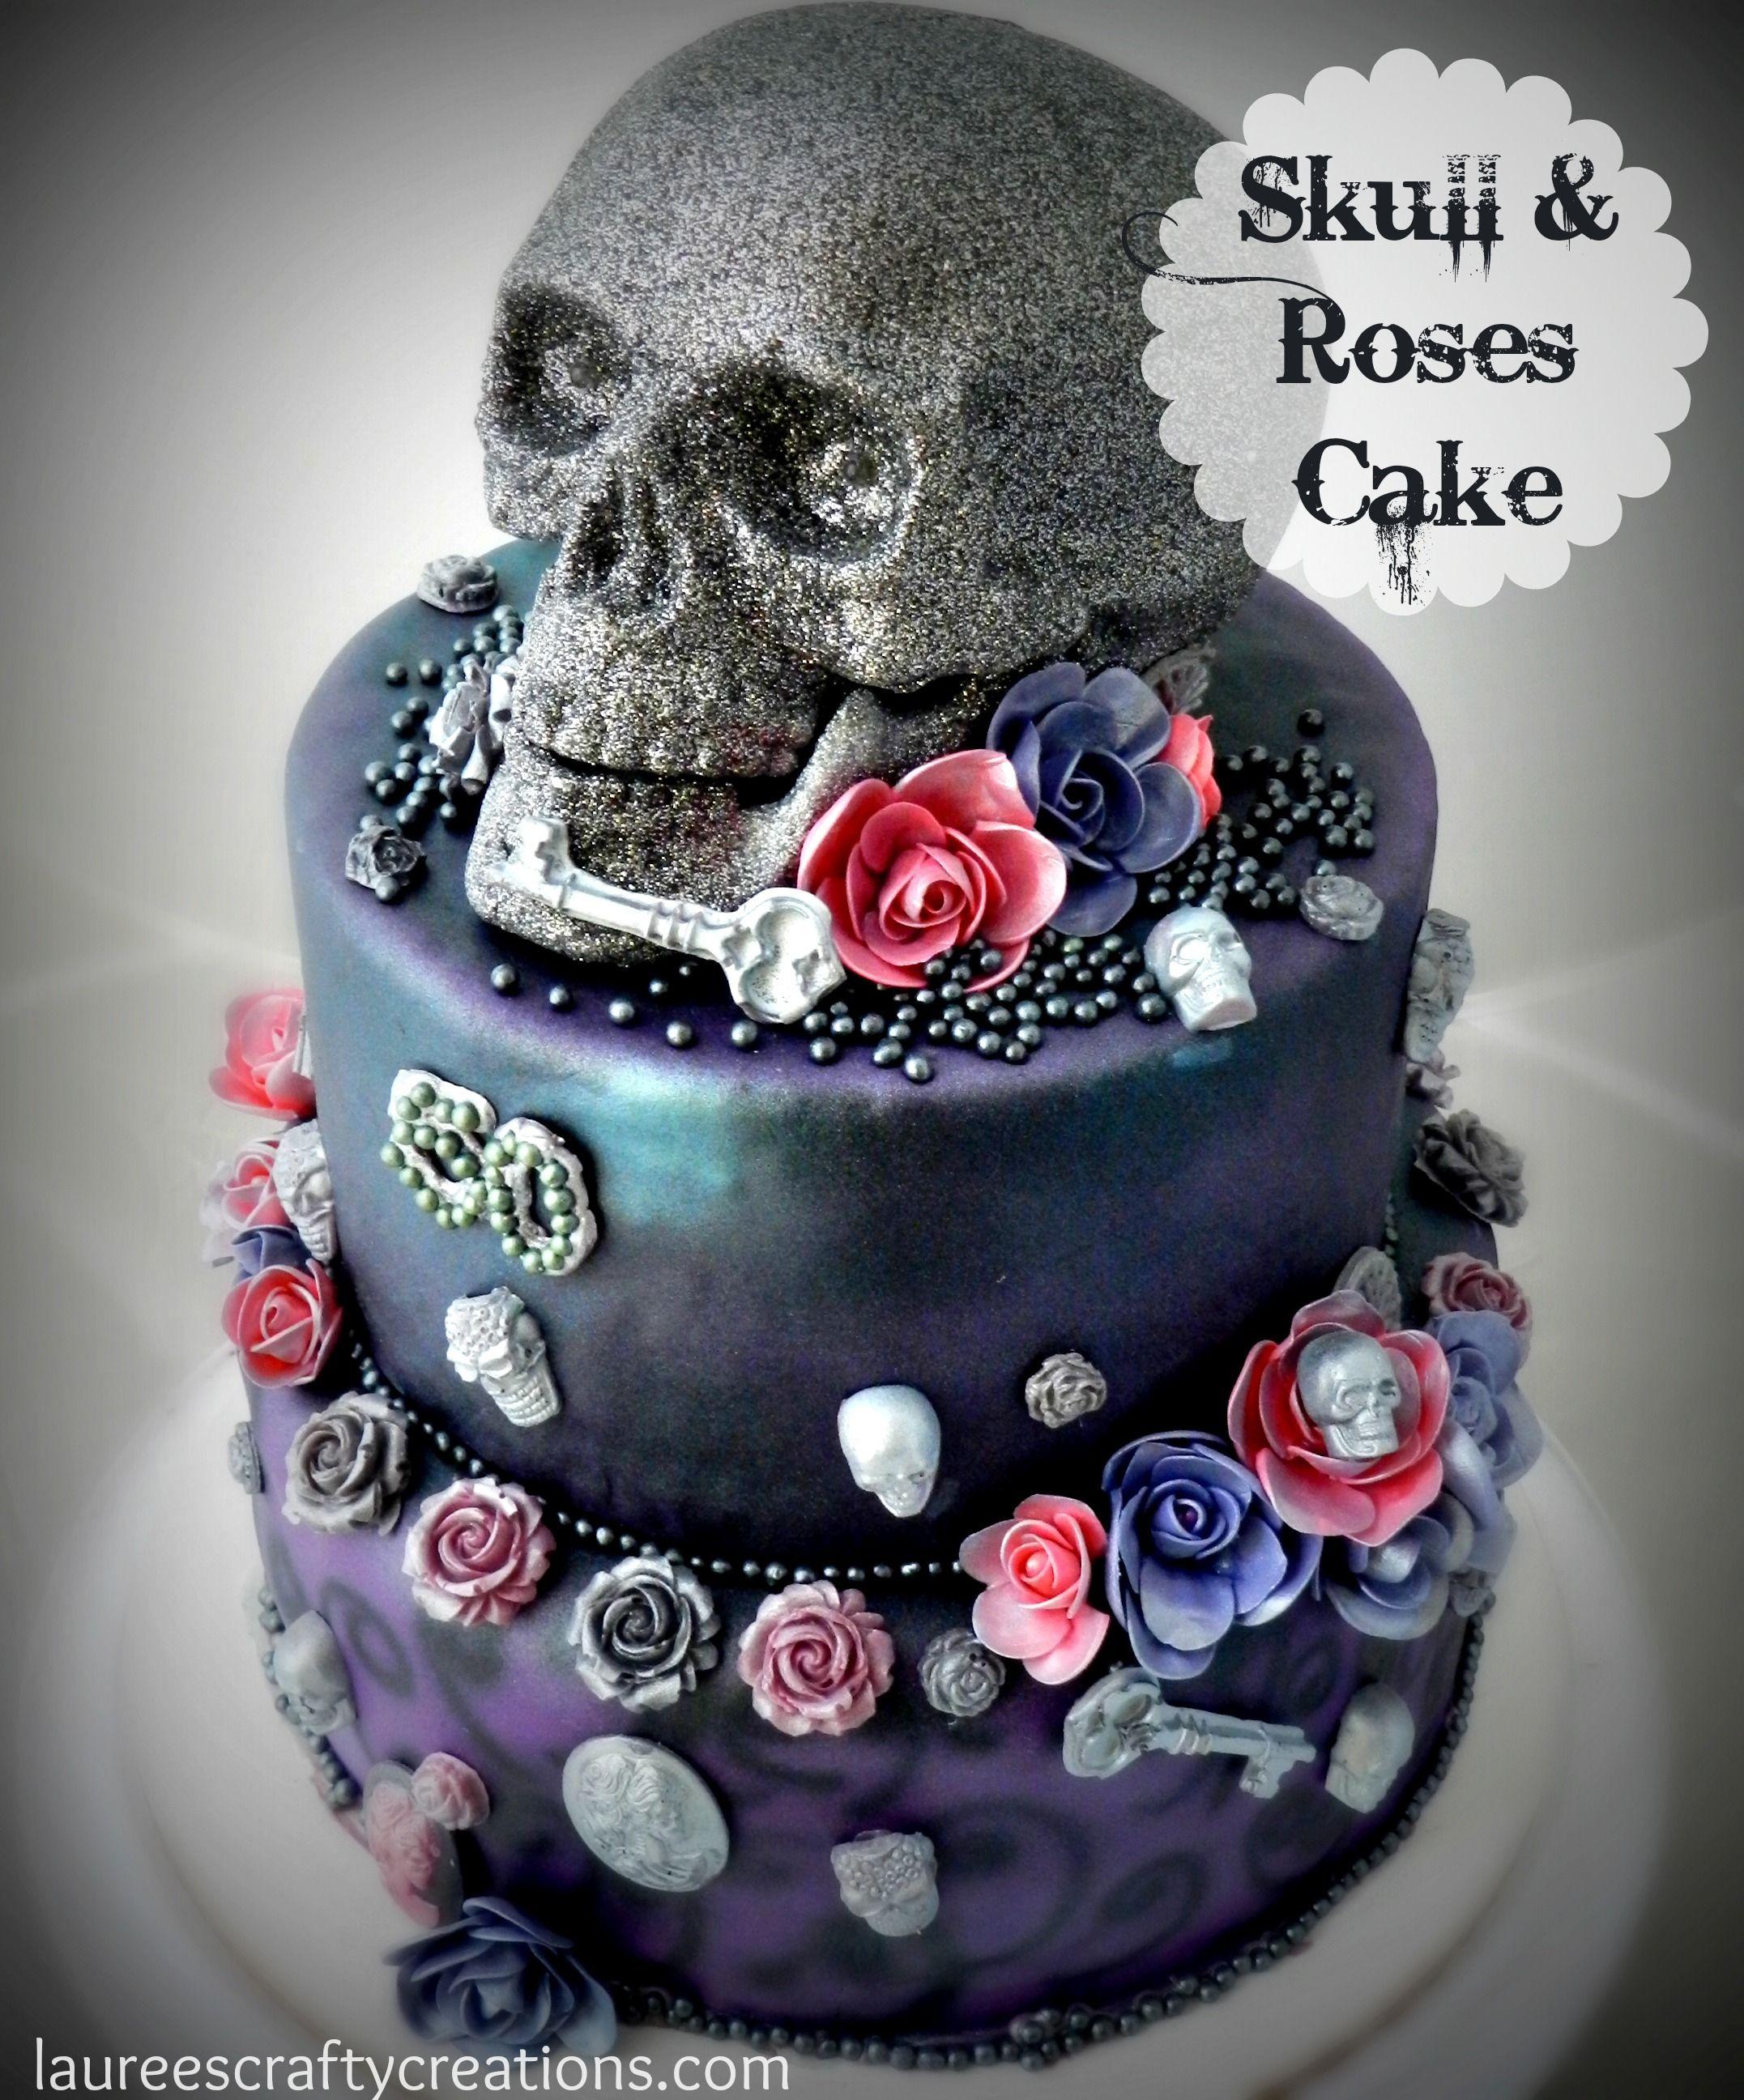 maya - dia de los muertos - sugar skull bakers 2014 - cake